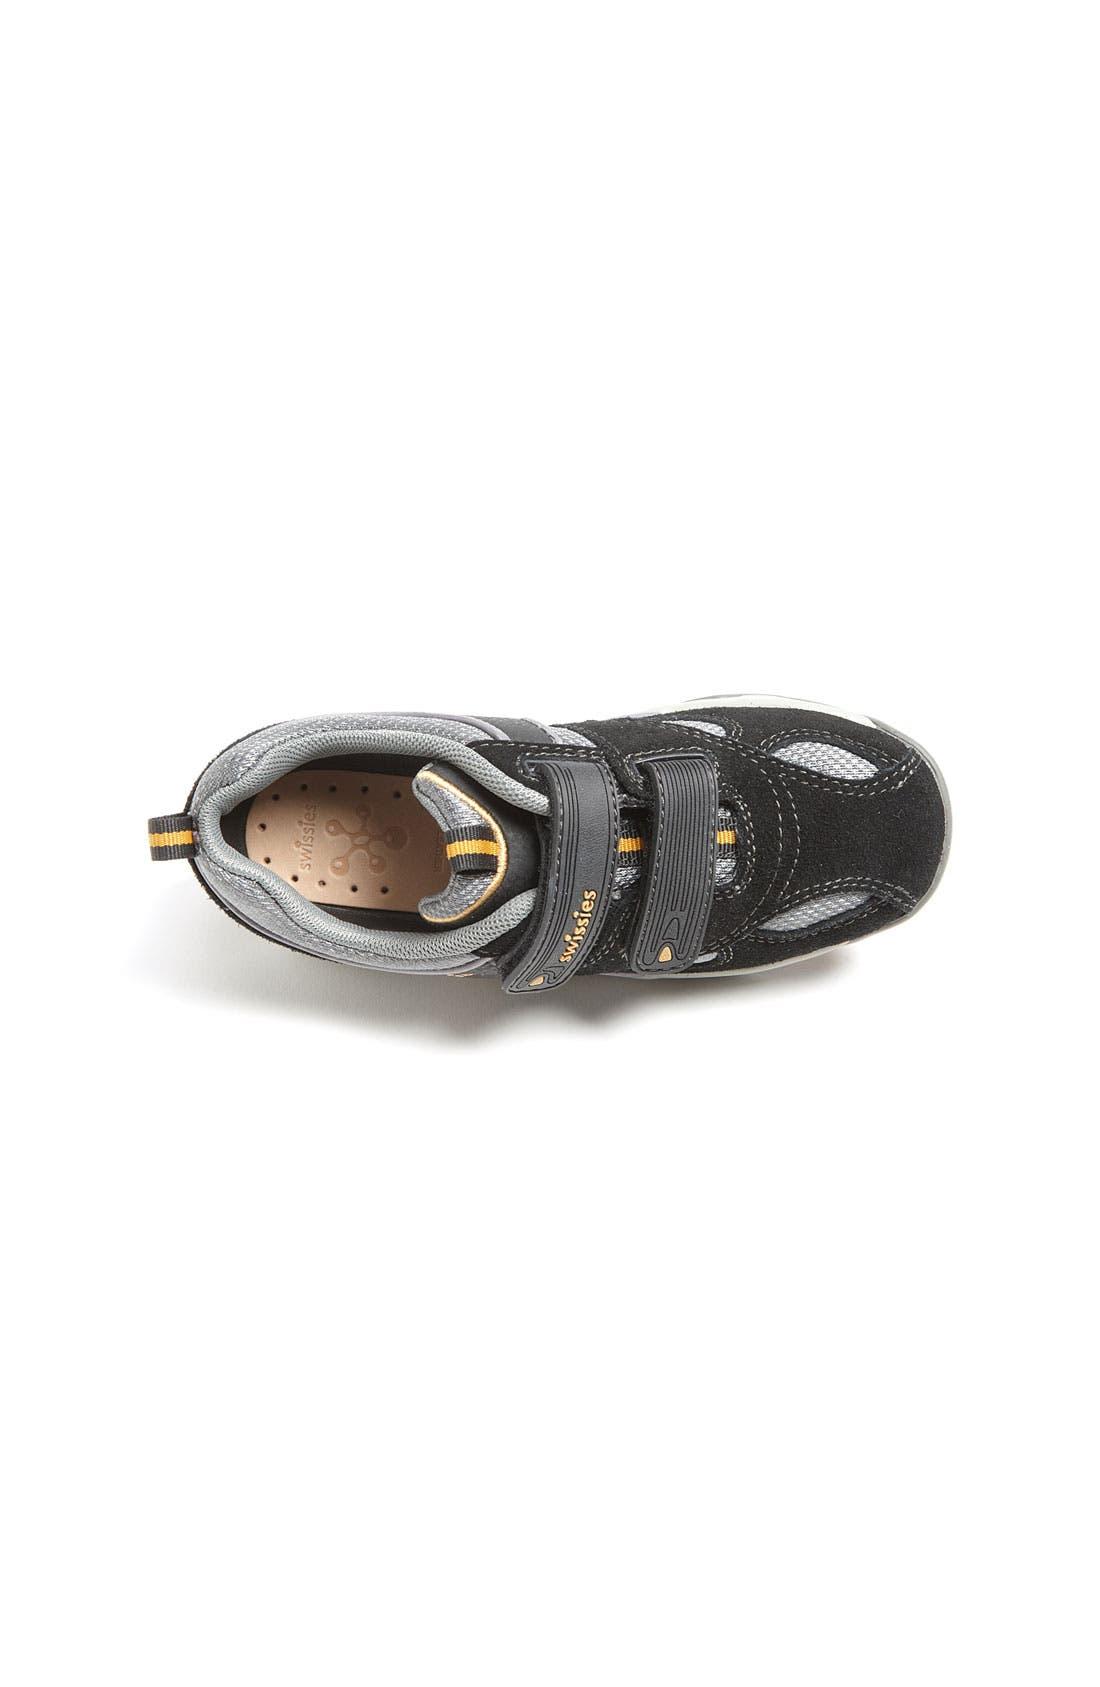 Alternate Image 3  - Swissies 'Mark' Athletic Sneaker (Toddler, Little Kid & Big Kid)